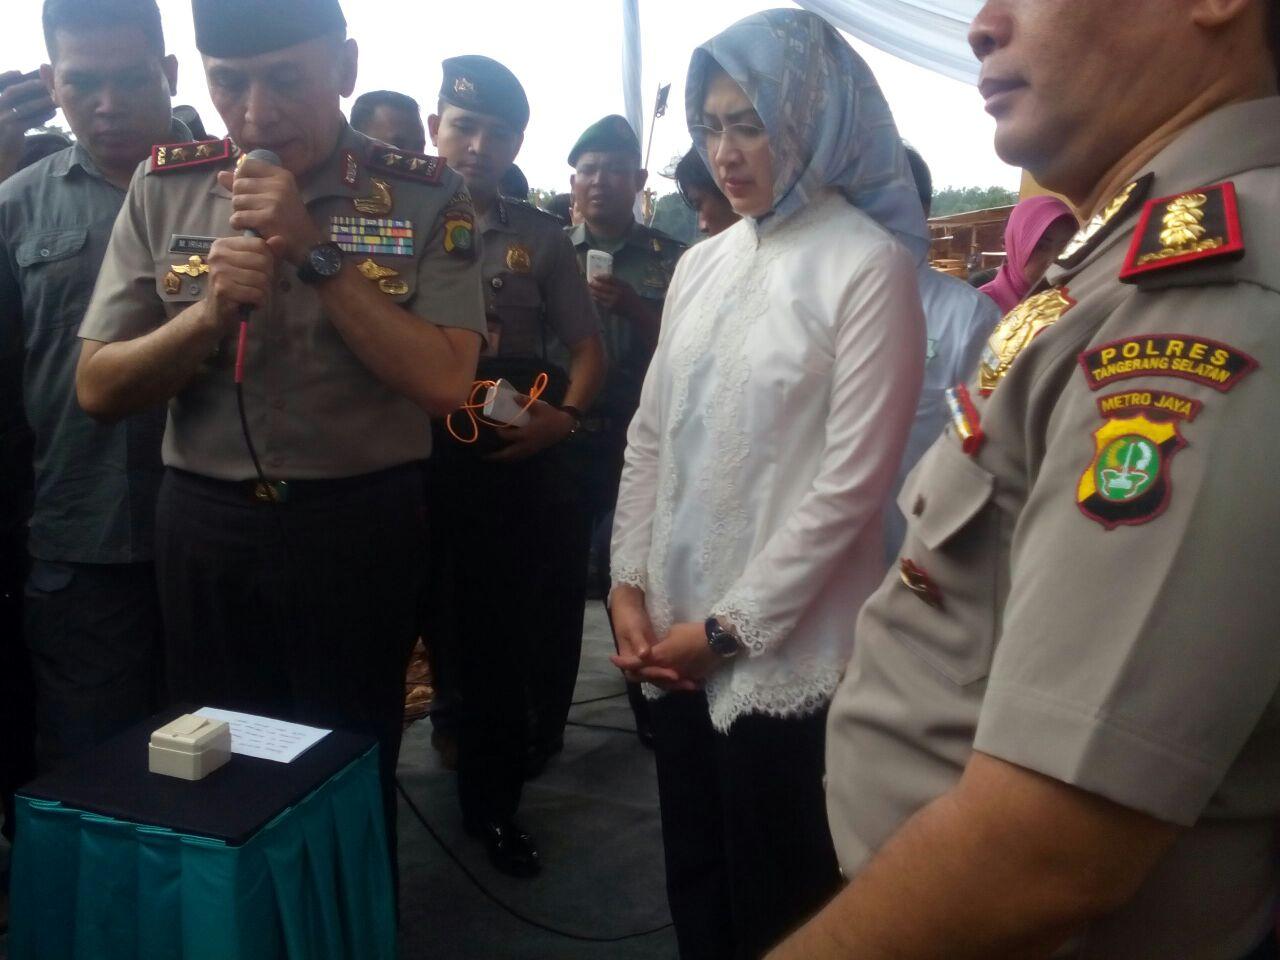 Airin dan Irjen Pol Moh Iriawan pada peresmian Masjid Daarul Aman di lingkungan Polres Tangsel (7/10/2016). Foto. Dok. Tangsel Media